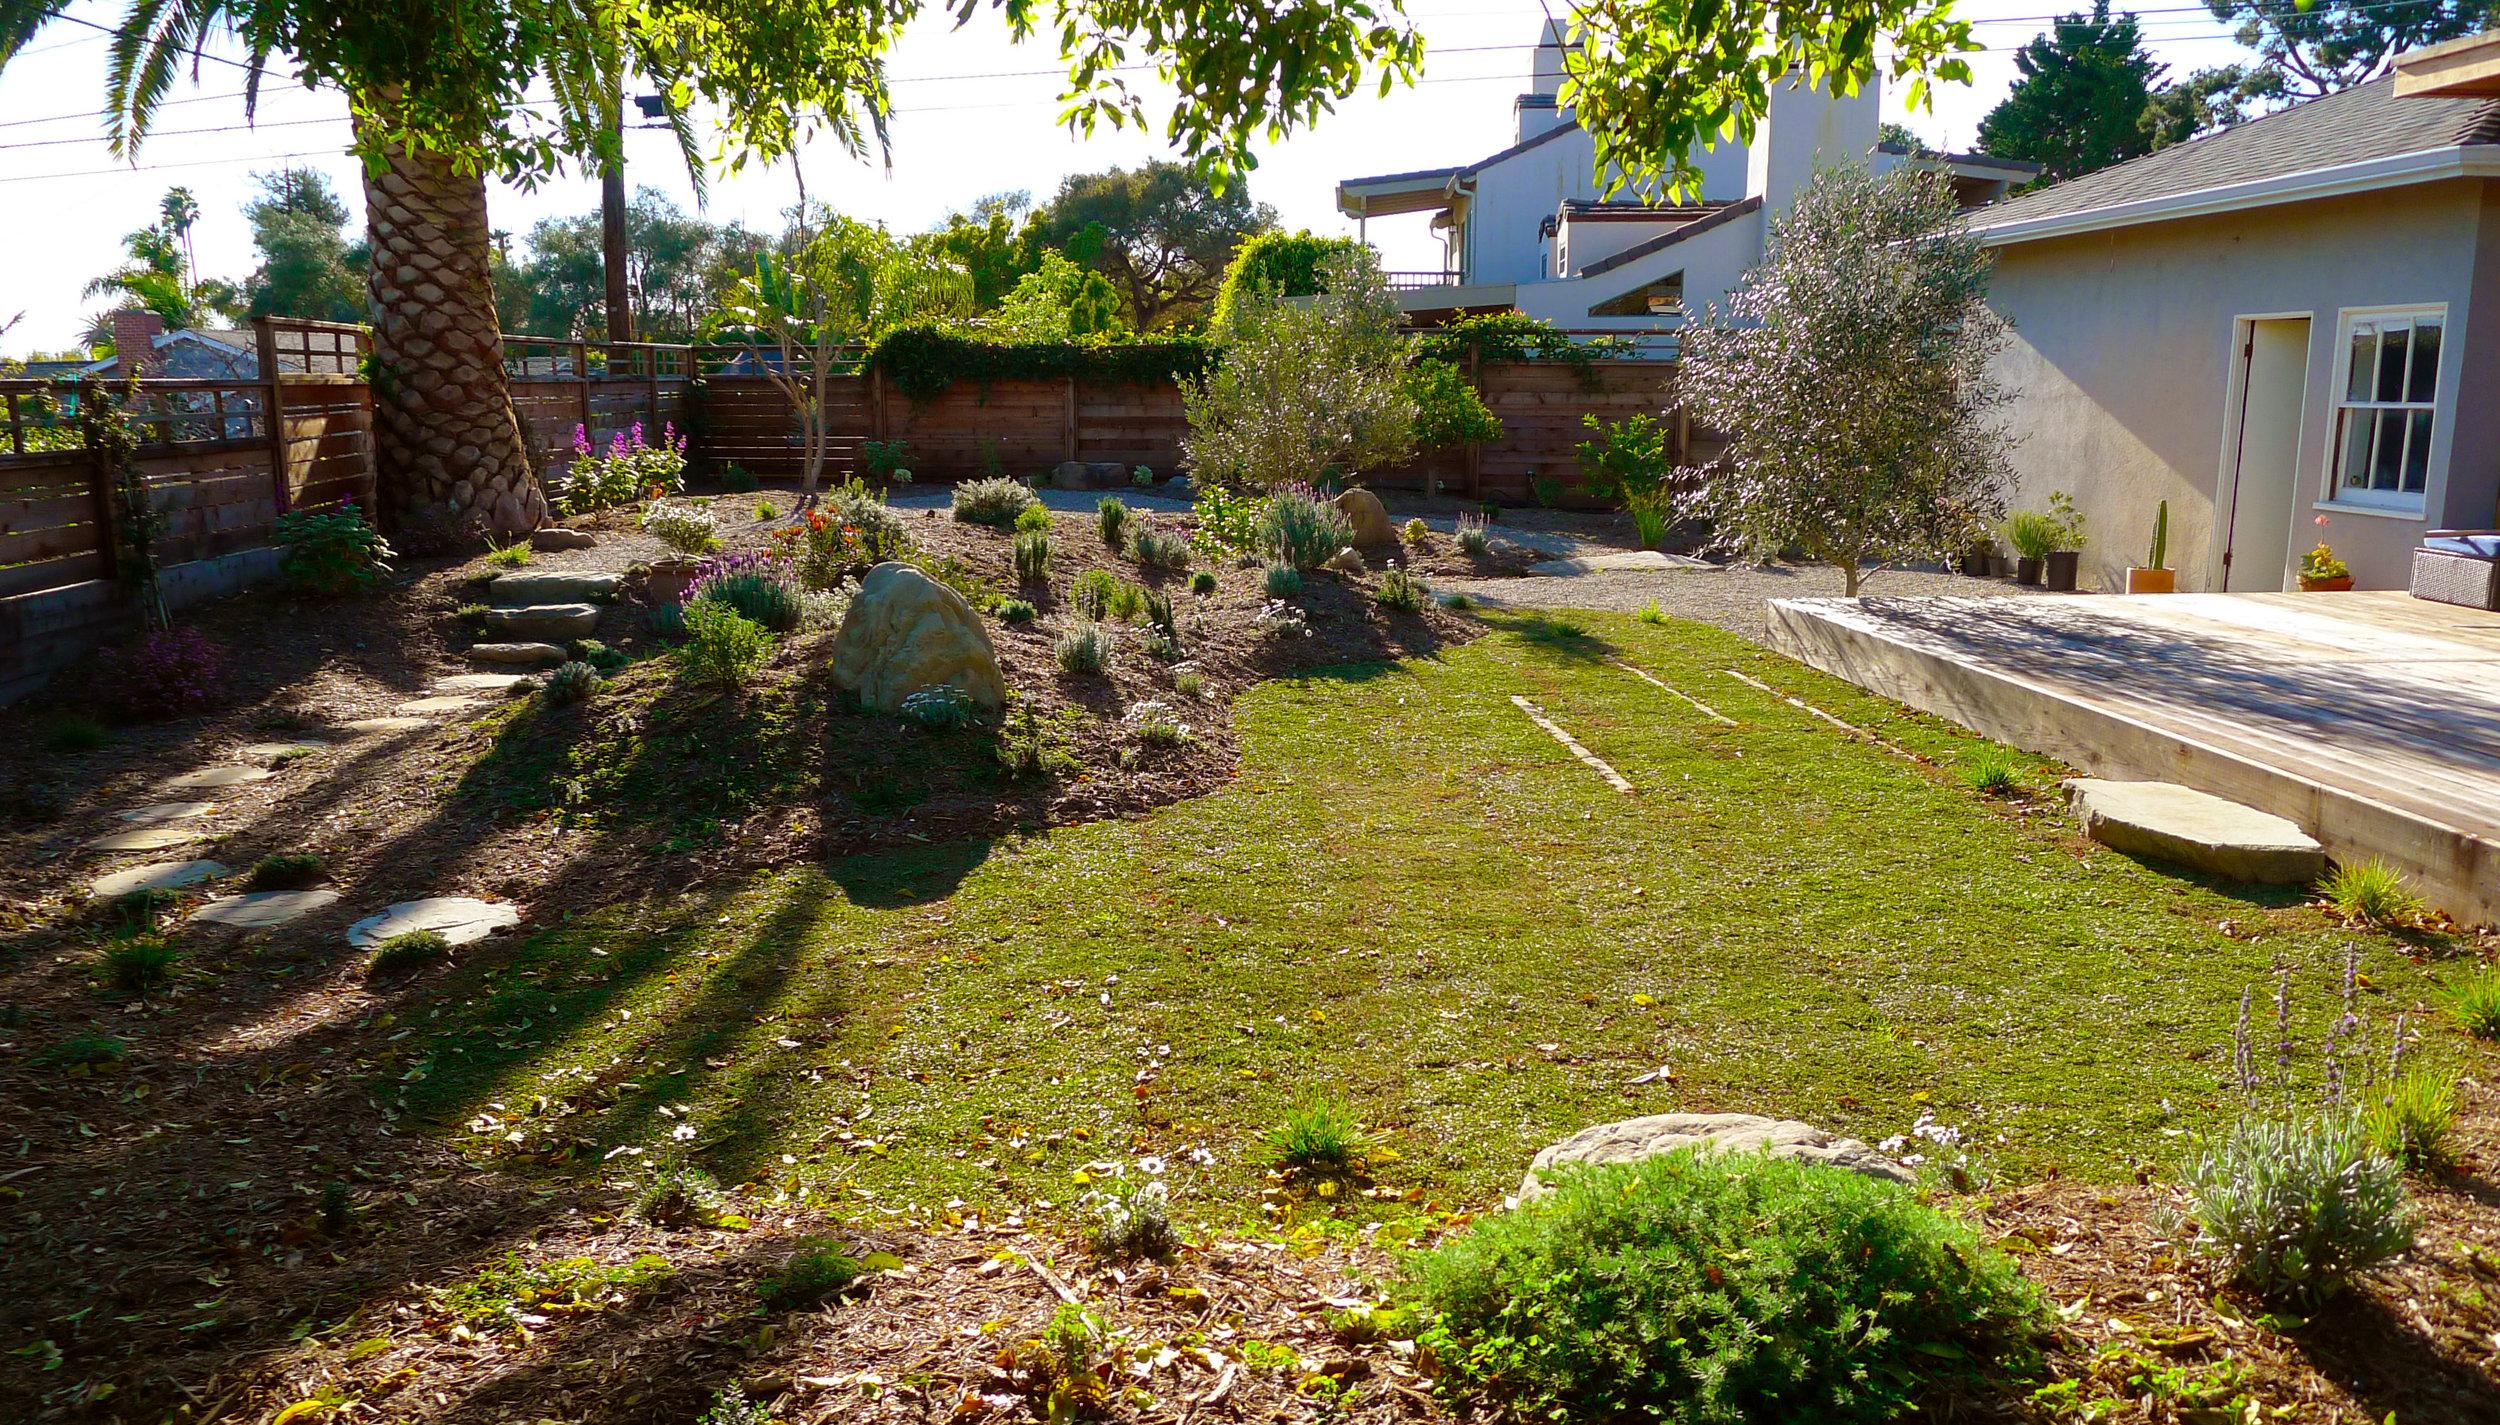 zen garden landscape with olive trees